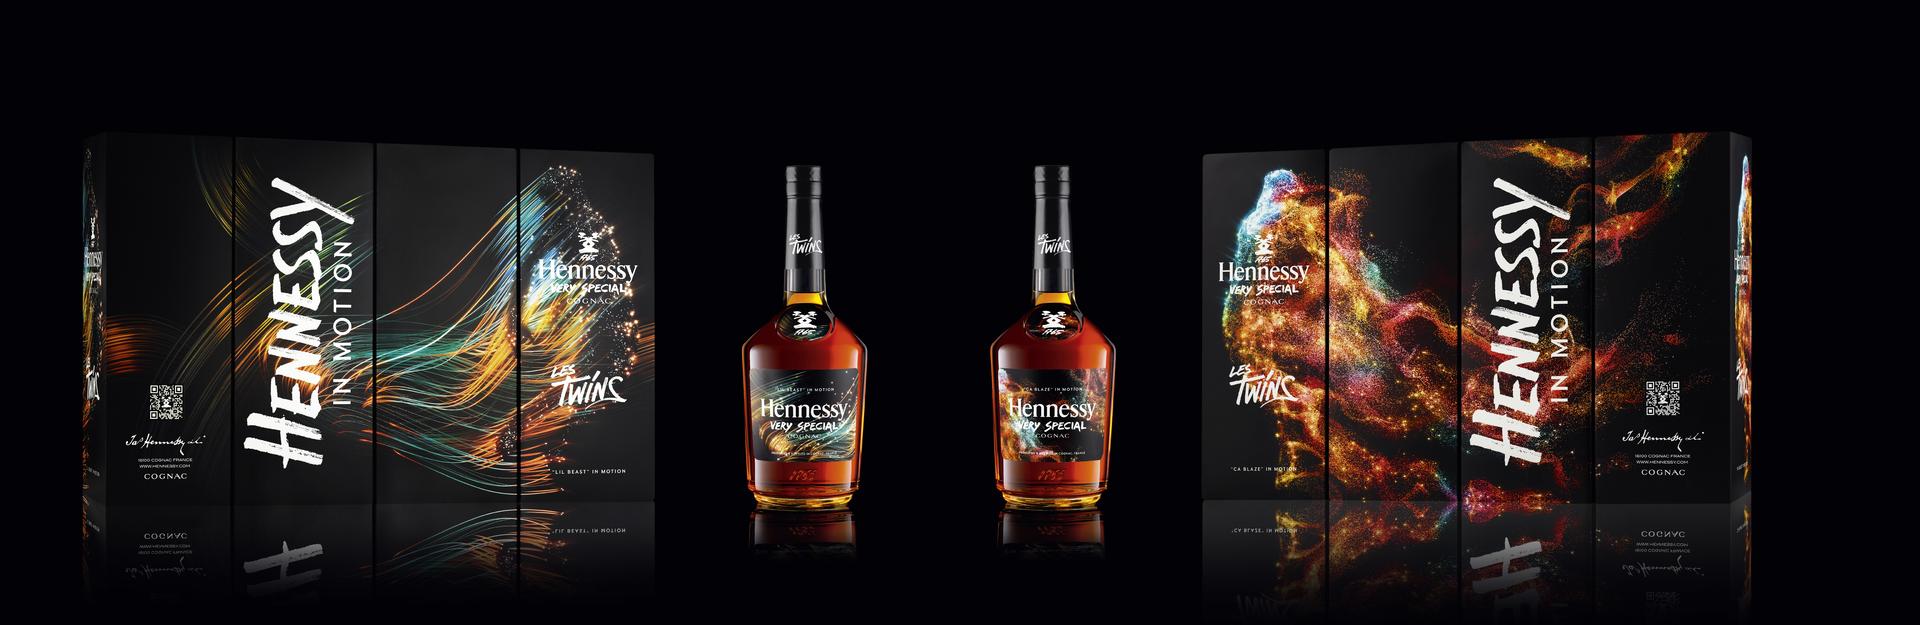 Limitovaná edice Hennessy Les Twins